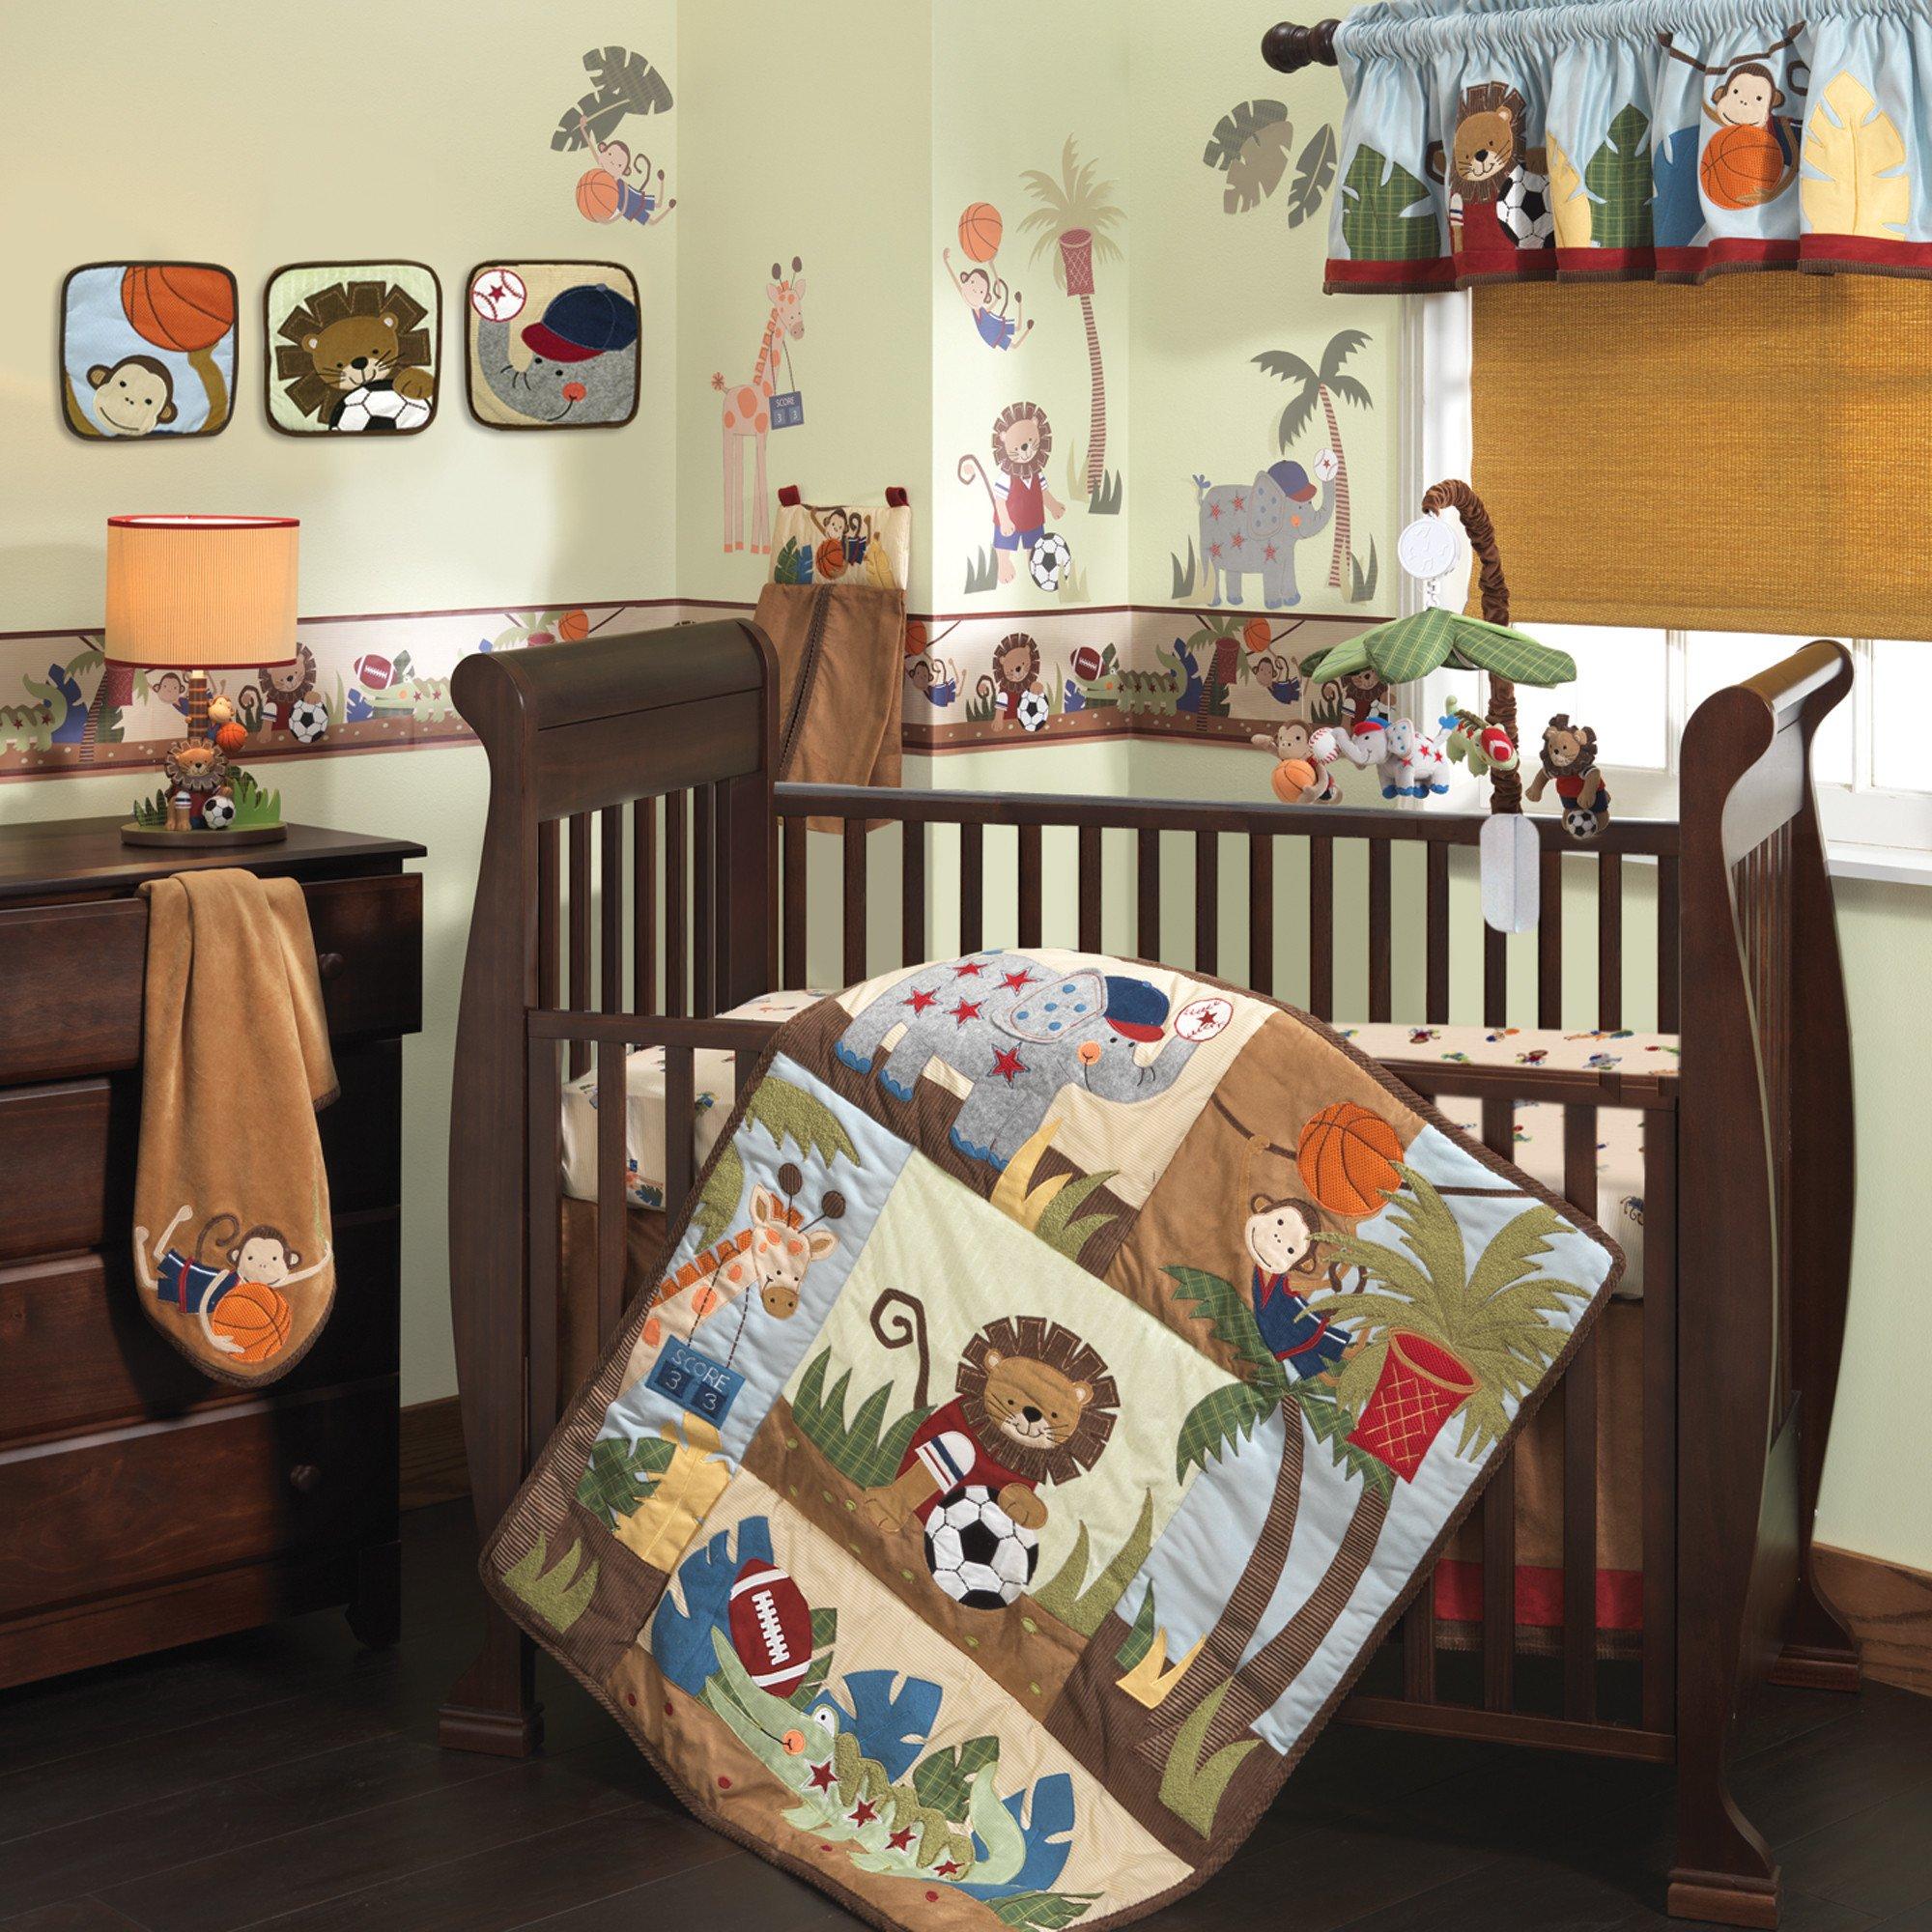 Lambs Amp Ivy Team Safari 9 Piece Crib Bedding Set Ideal Baby